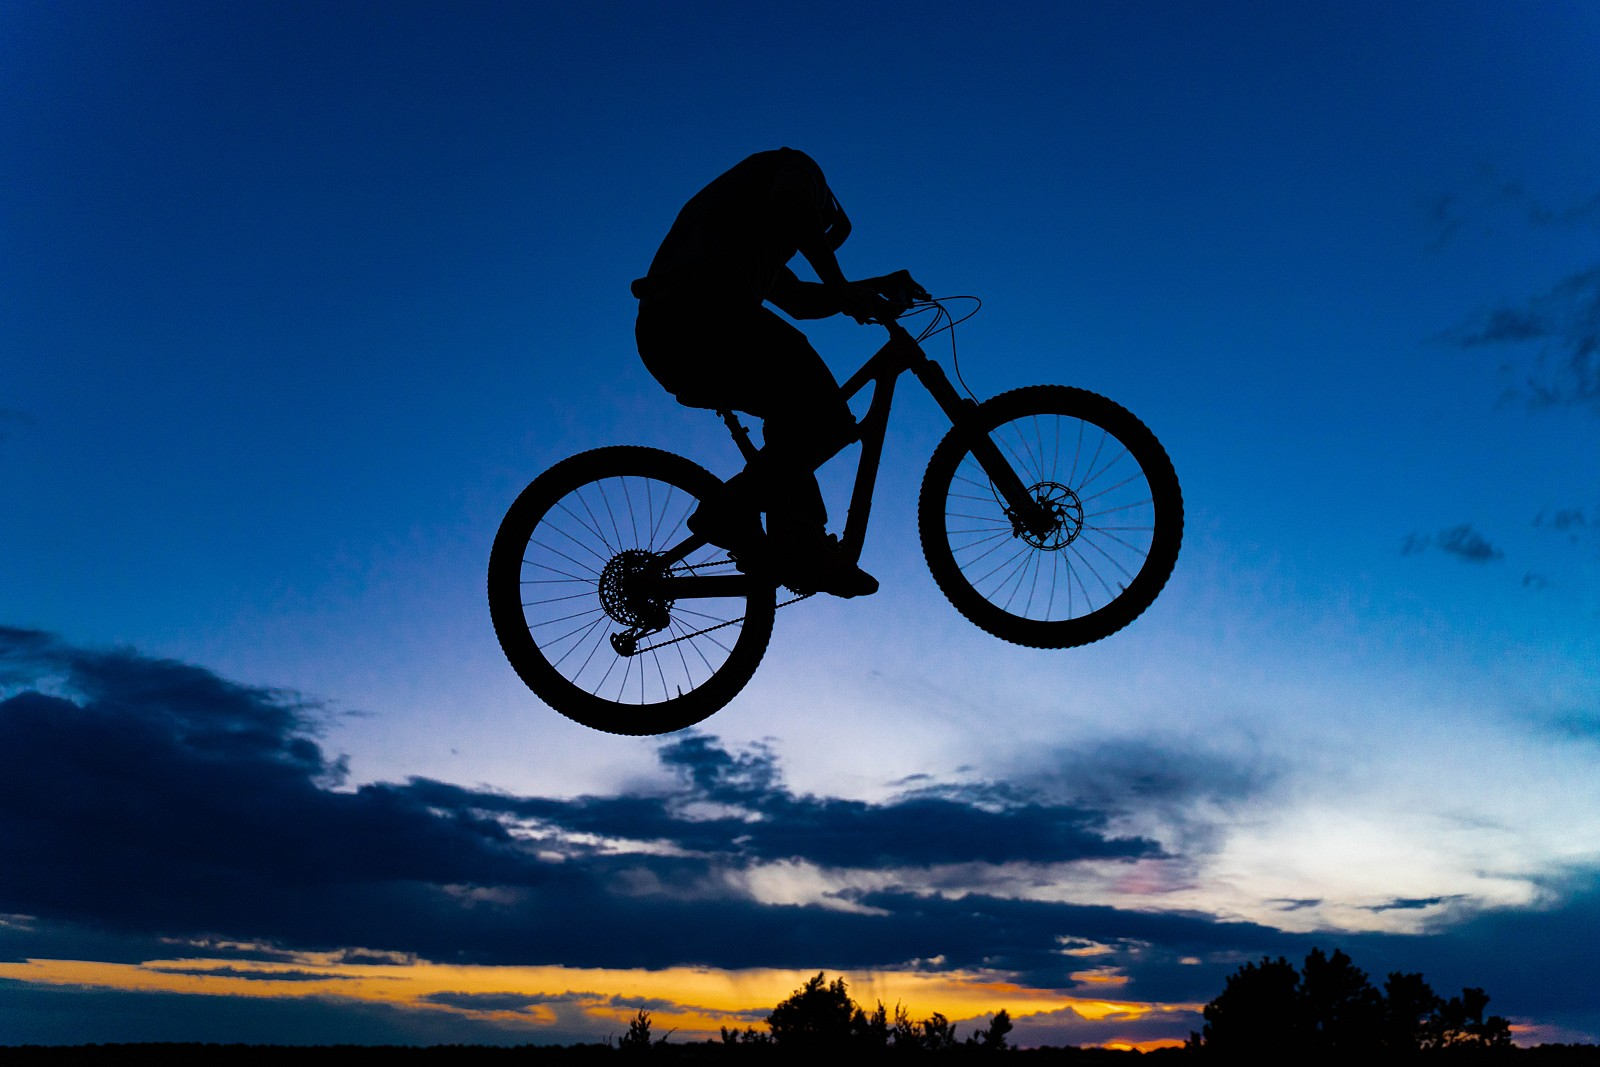 Silhouette Sender - legpwr - Mountain Biking Pictures - Vital MTB